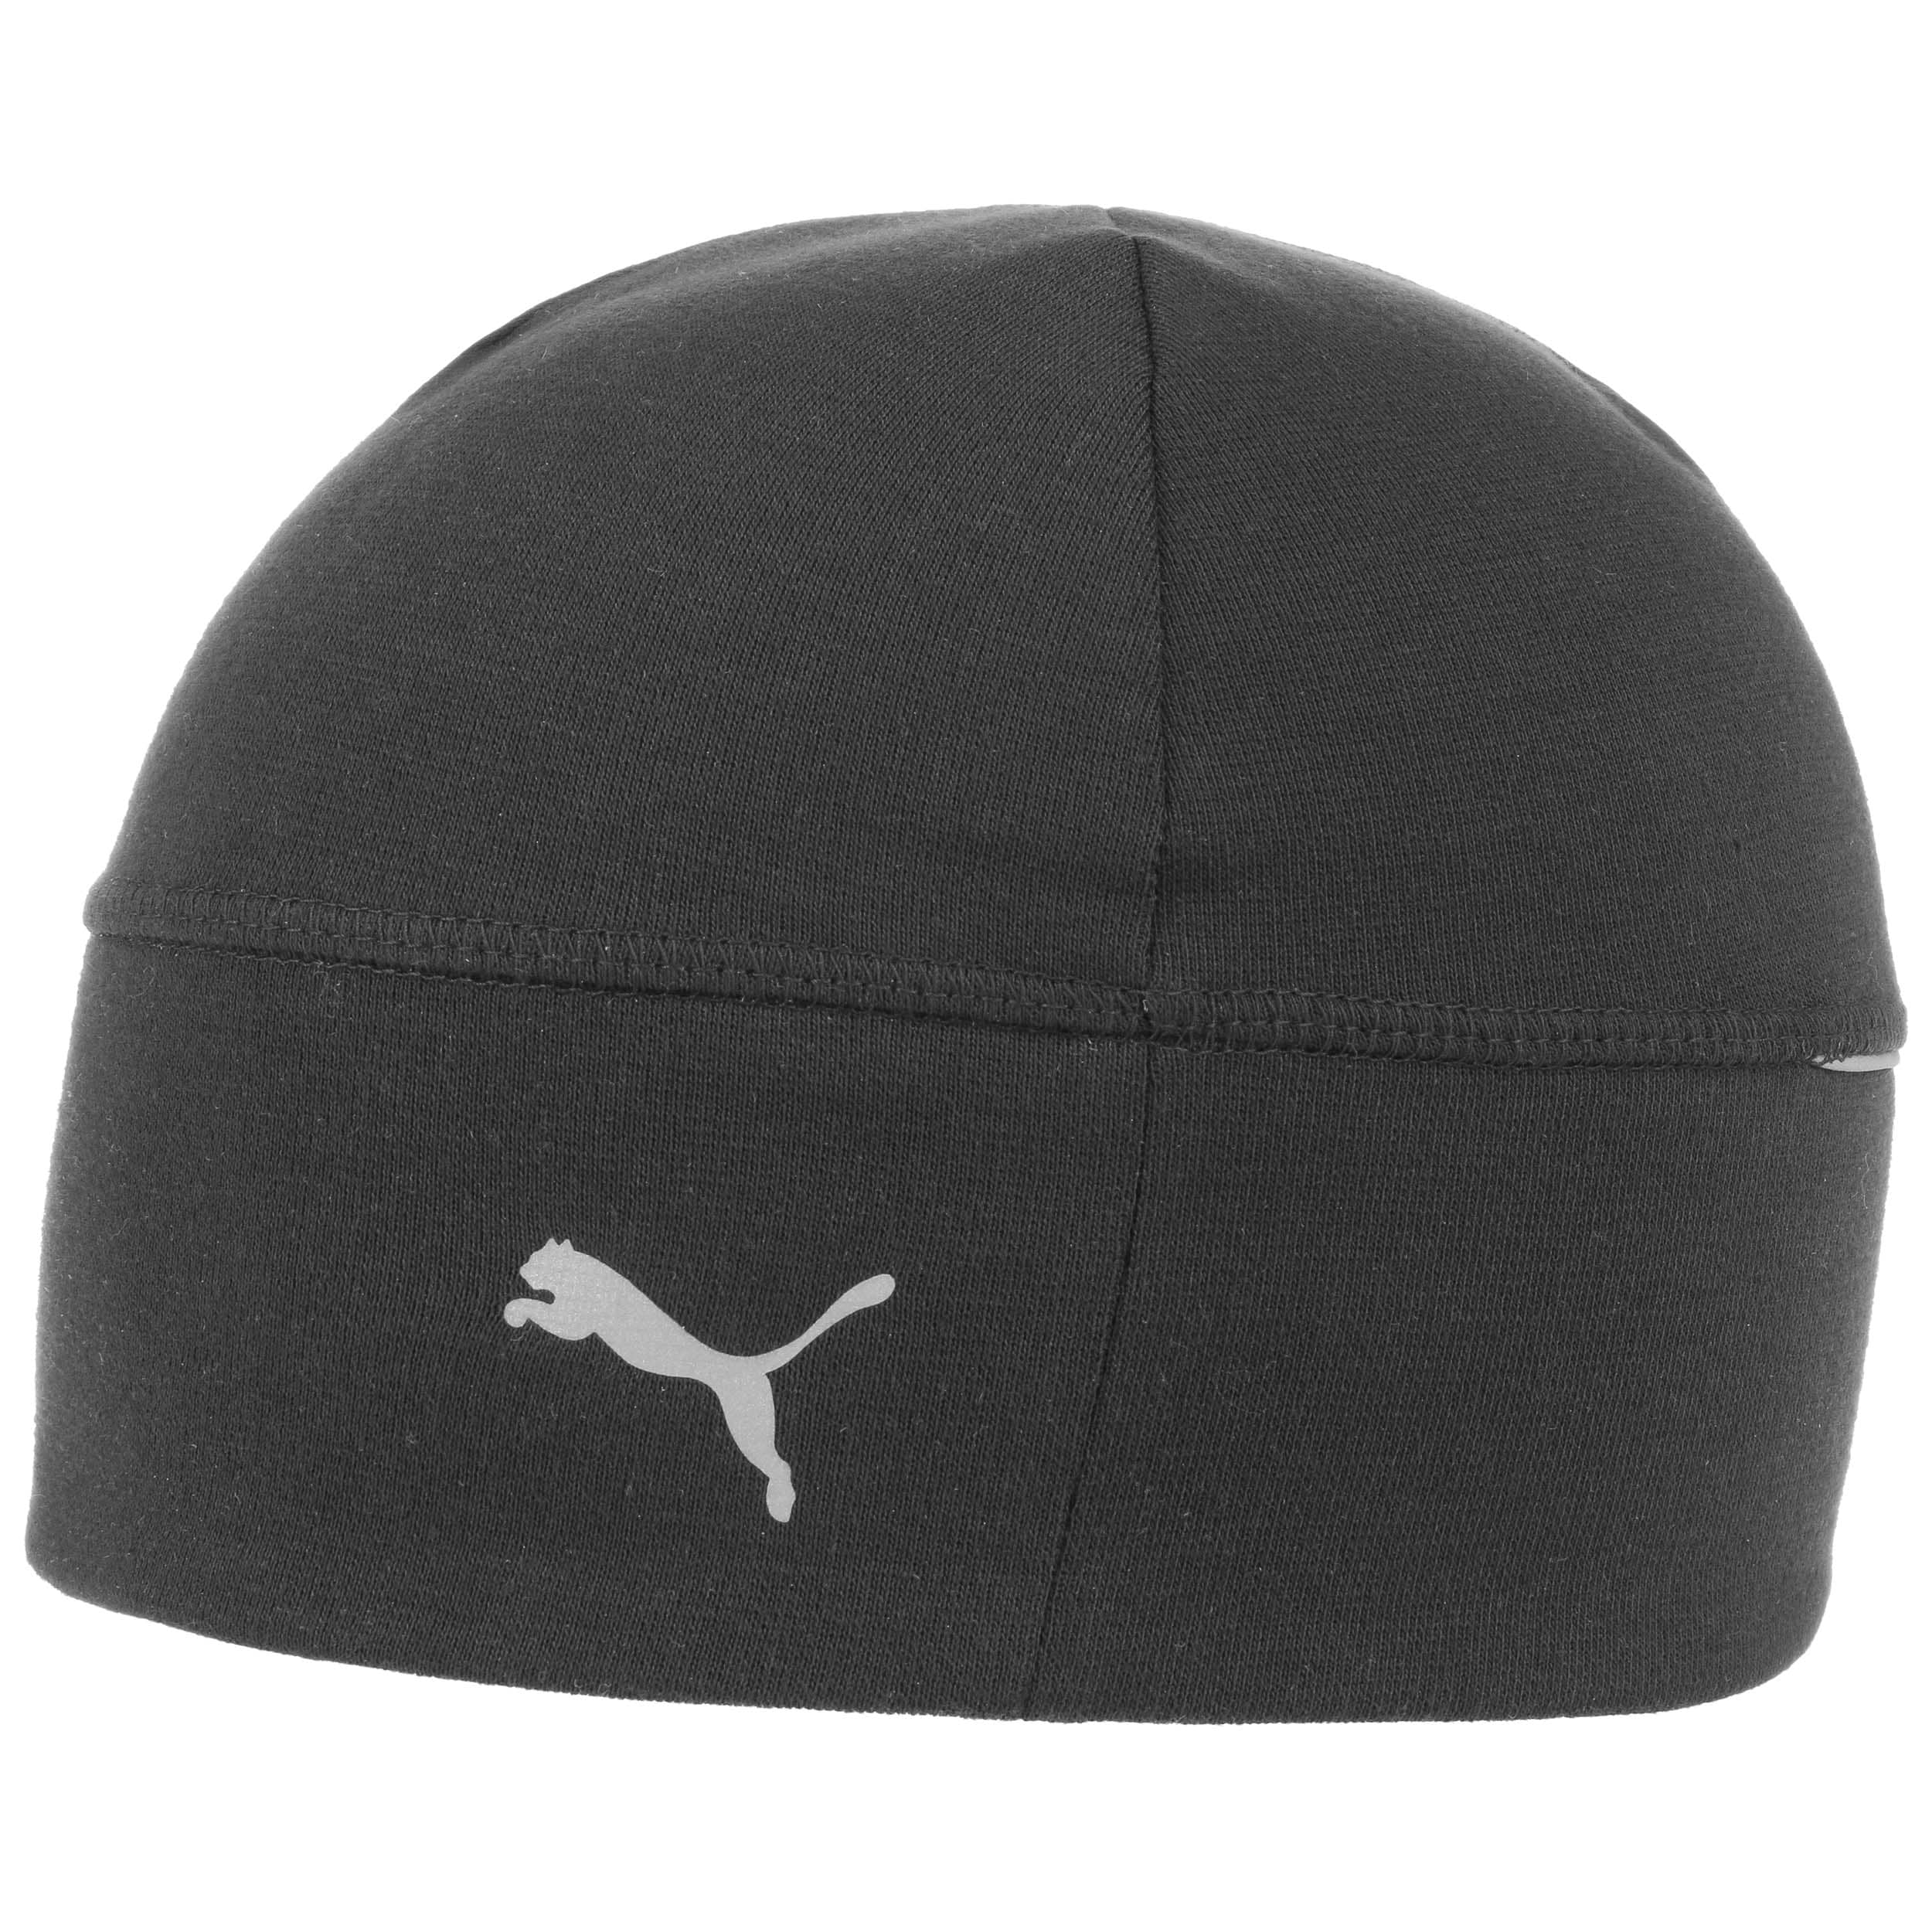 312bd43f69a ... Reflective Running Beanie Hat by PUMA - black 1 ...